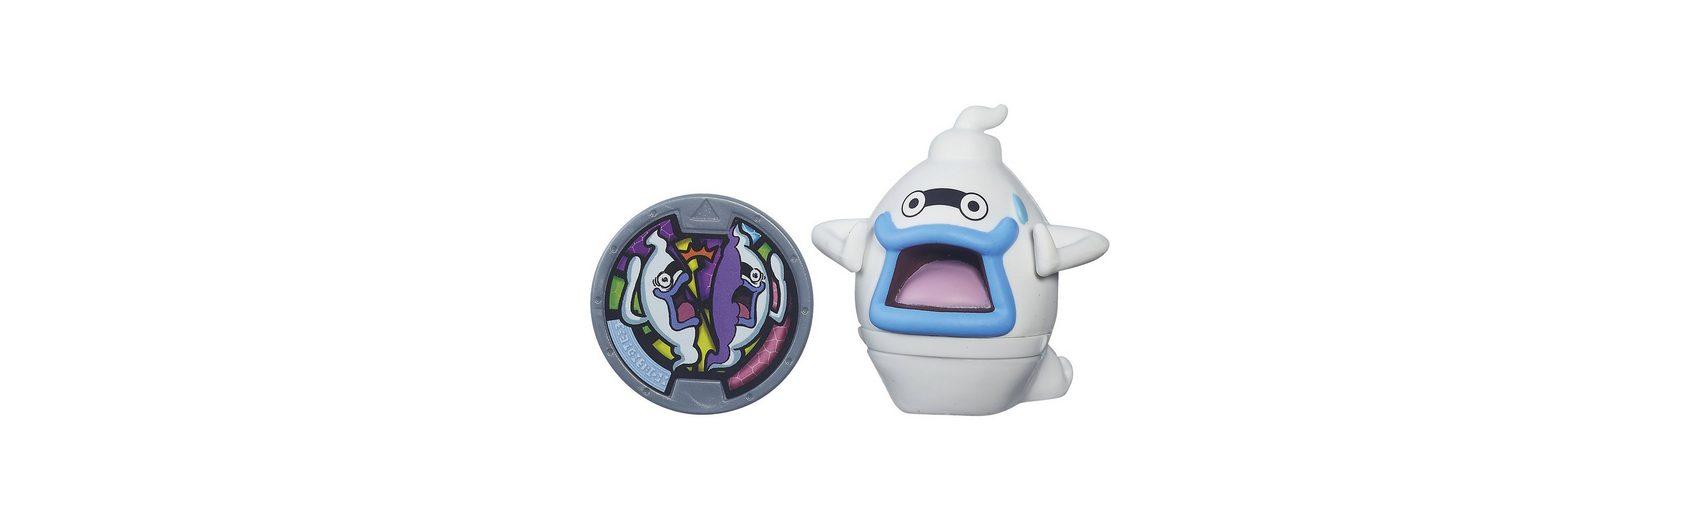 Hasbro Yo-Kai Watch - Medaillenfreunde - Whisper